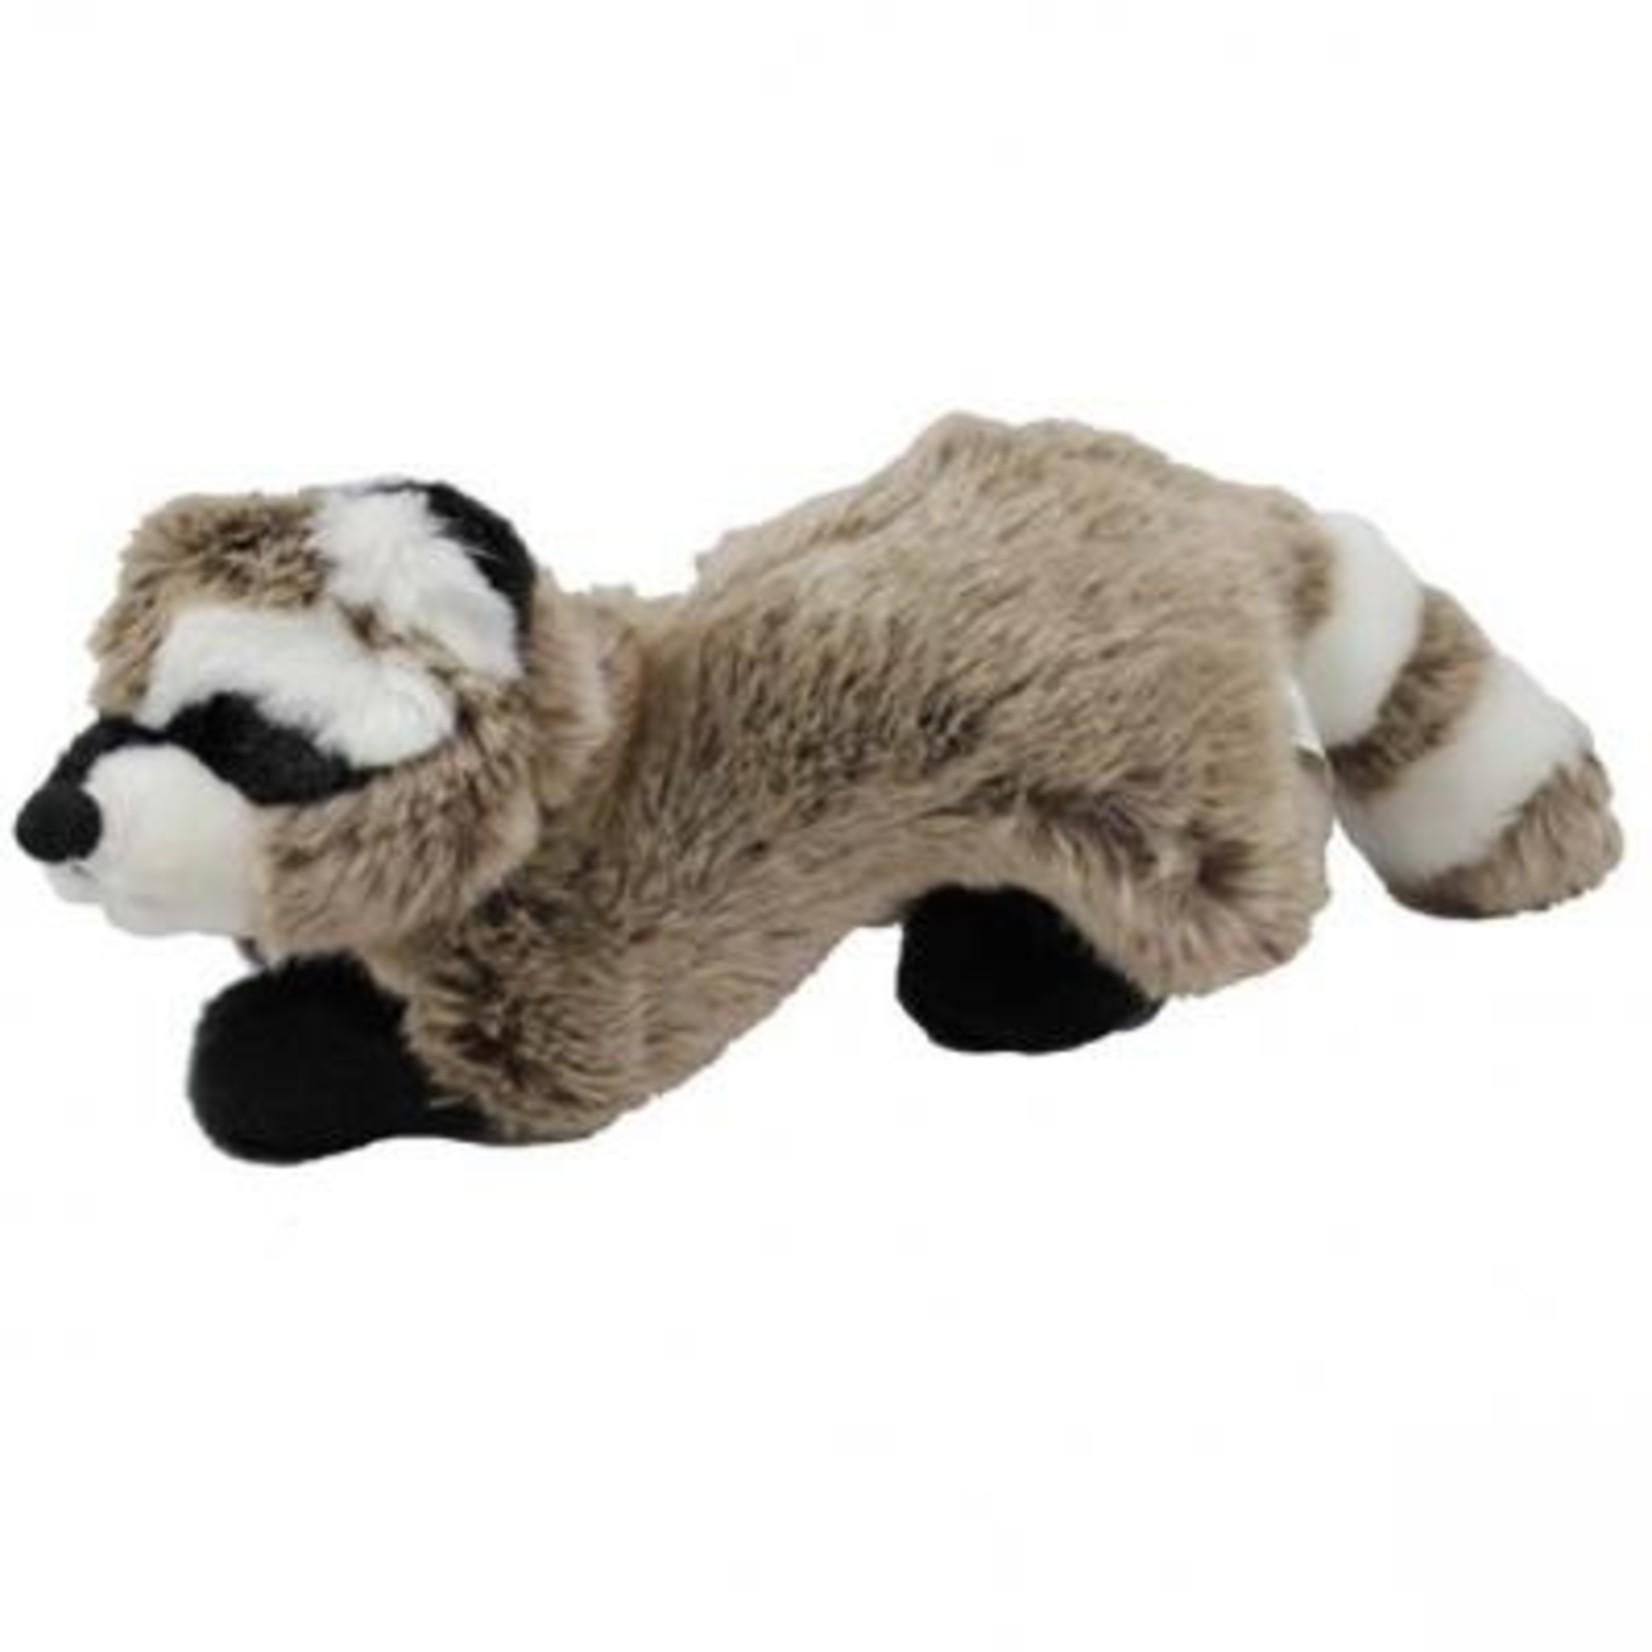 Fluff & Tuff Fluff & Tuff Rocket Raccoon Dog Toy Large